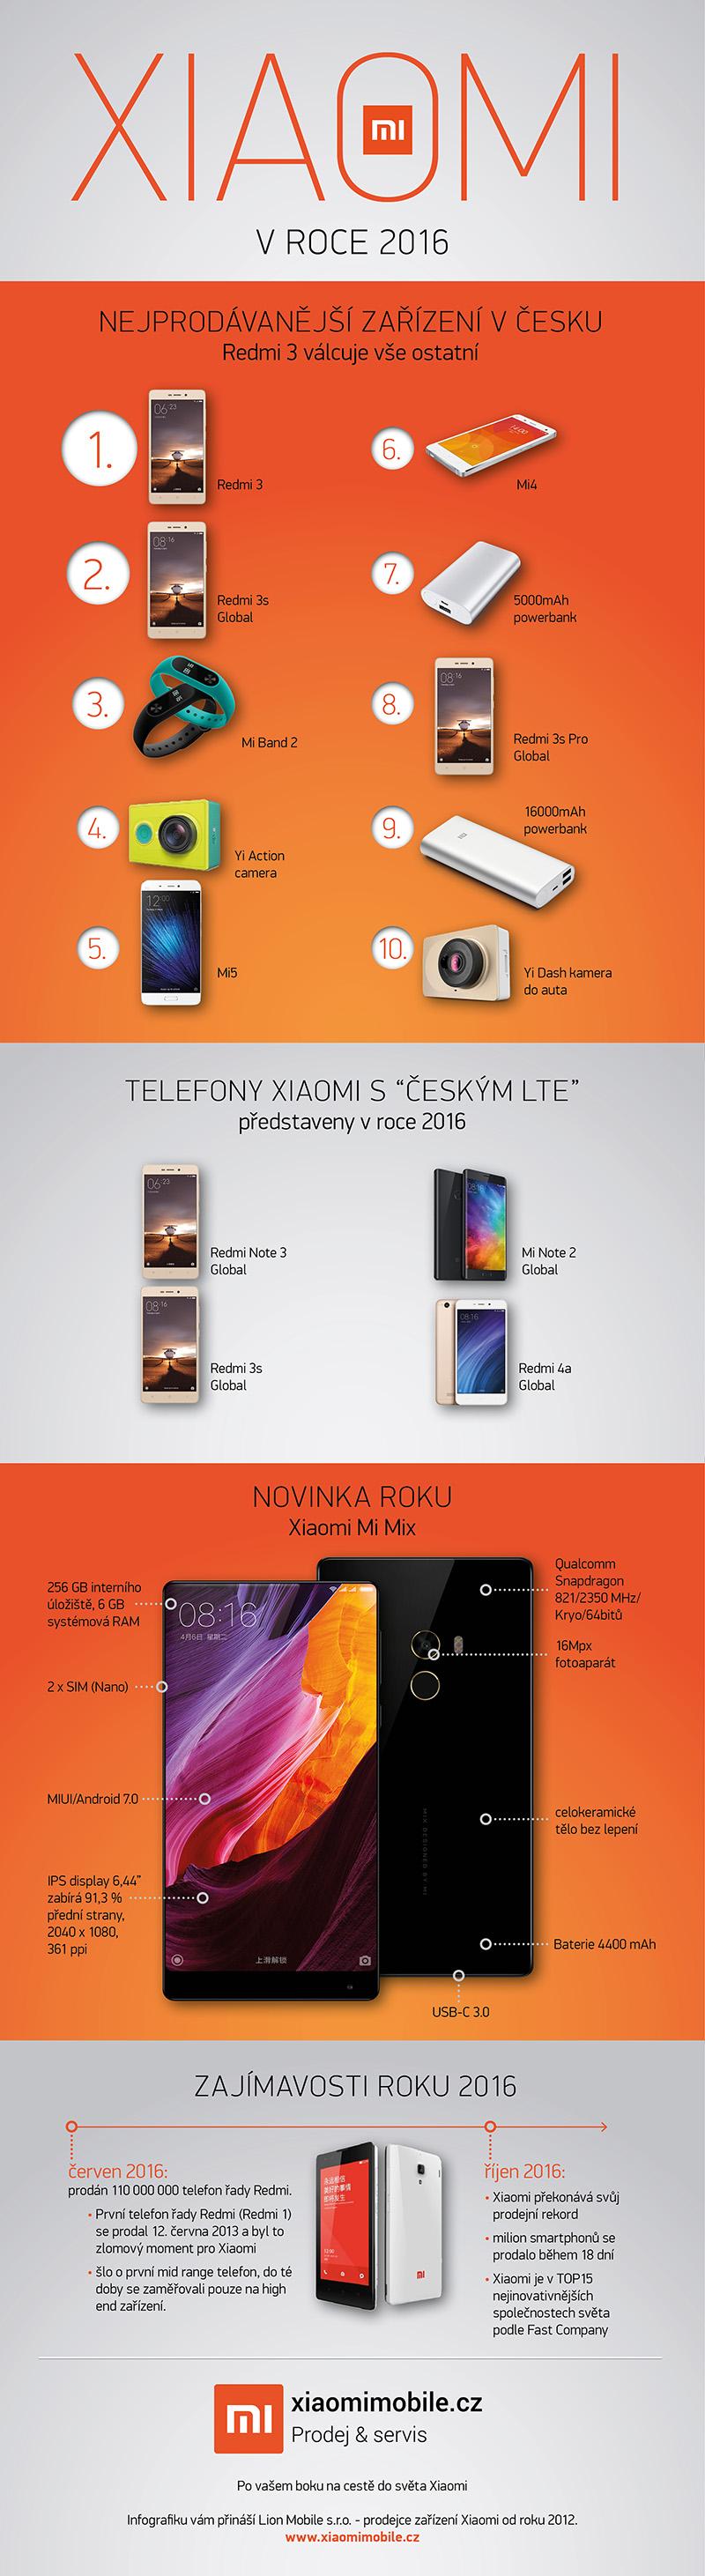 infografika Xiaomi 2016